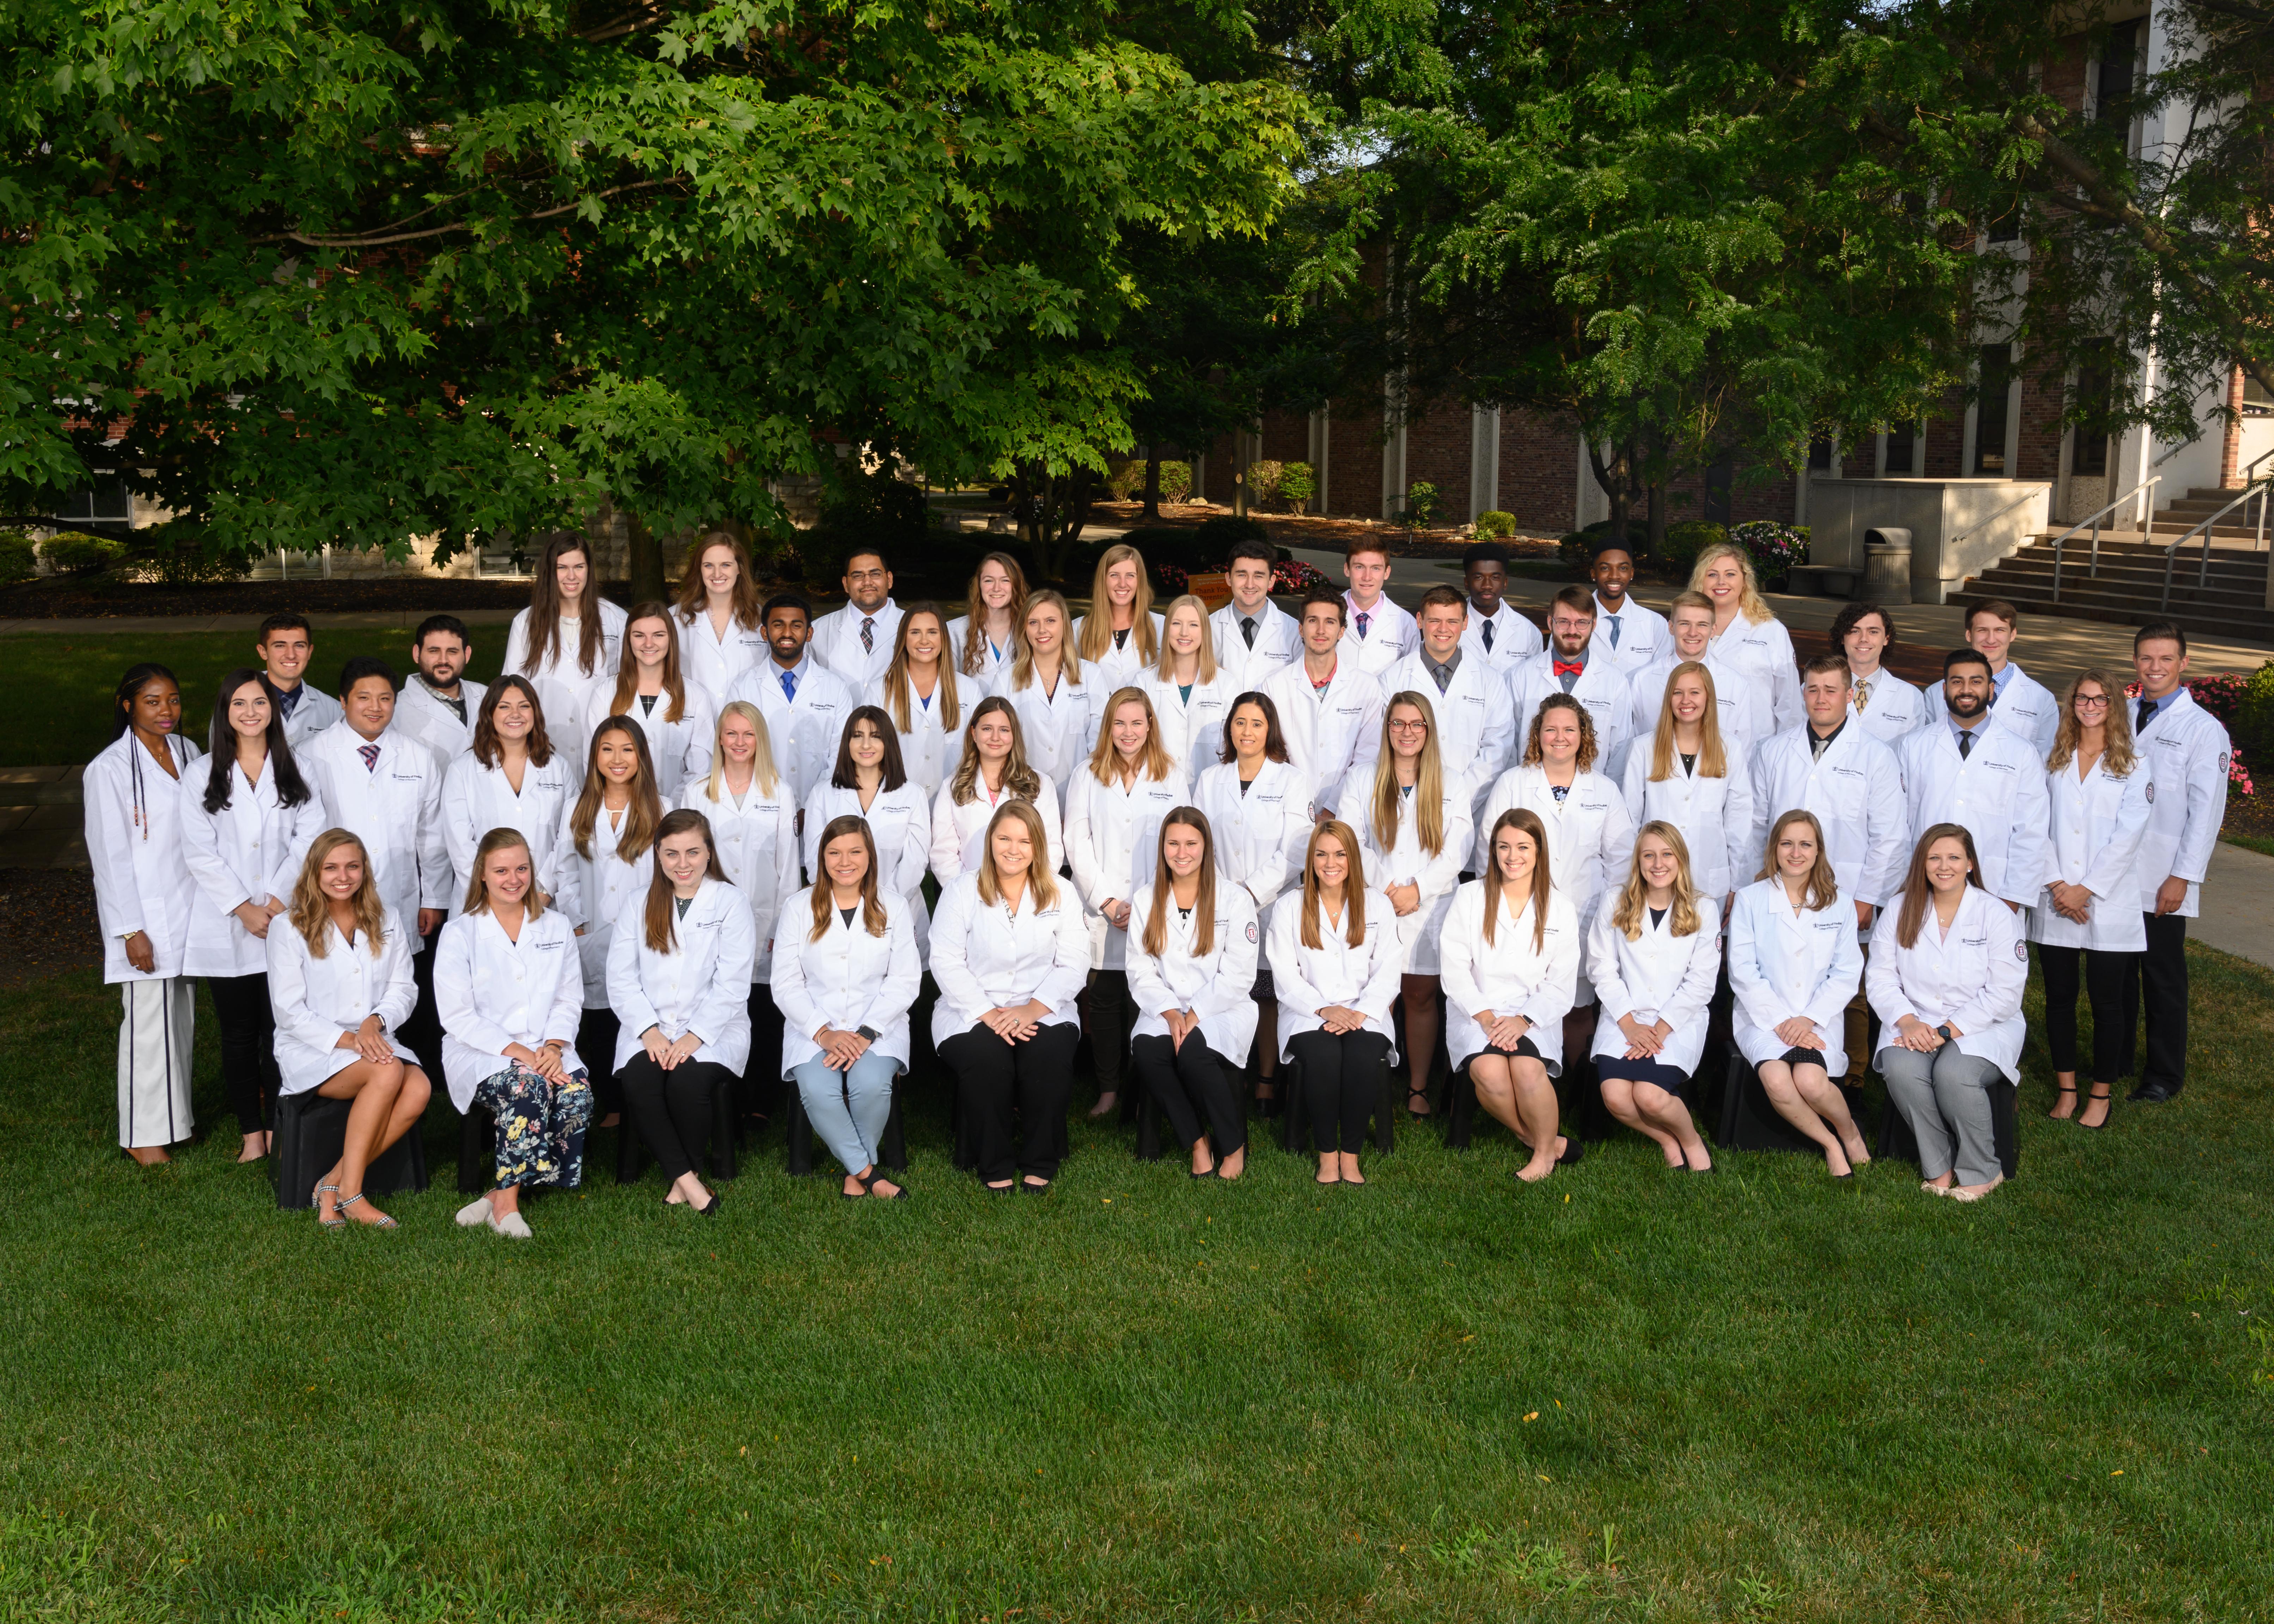 White coat class of 2023 class photo